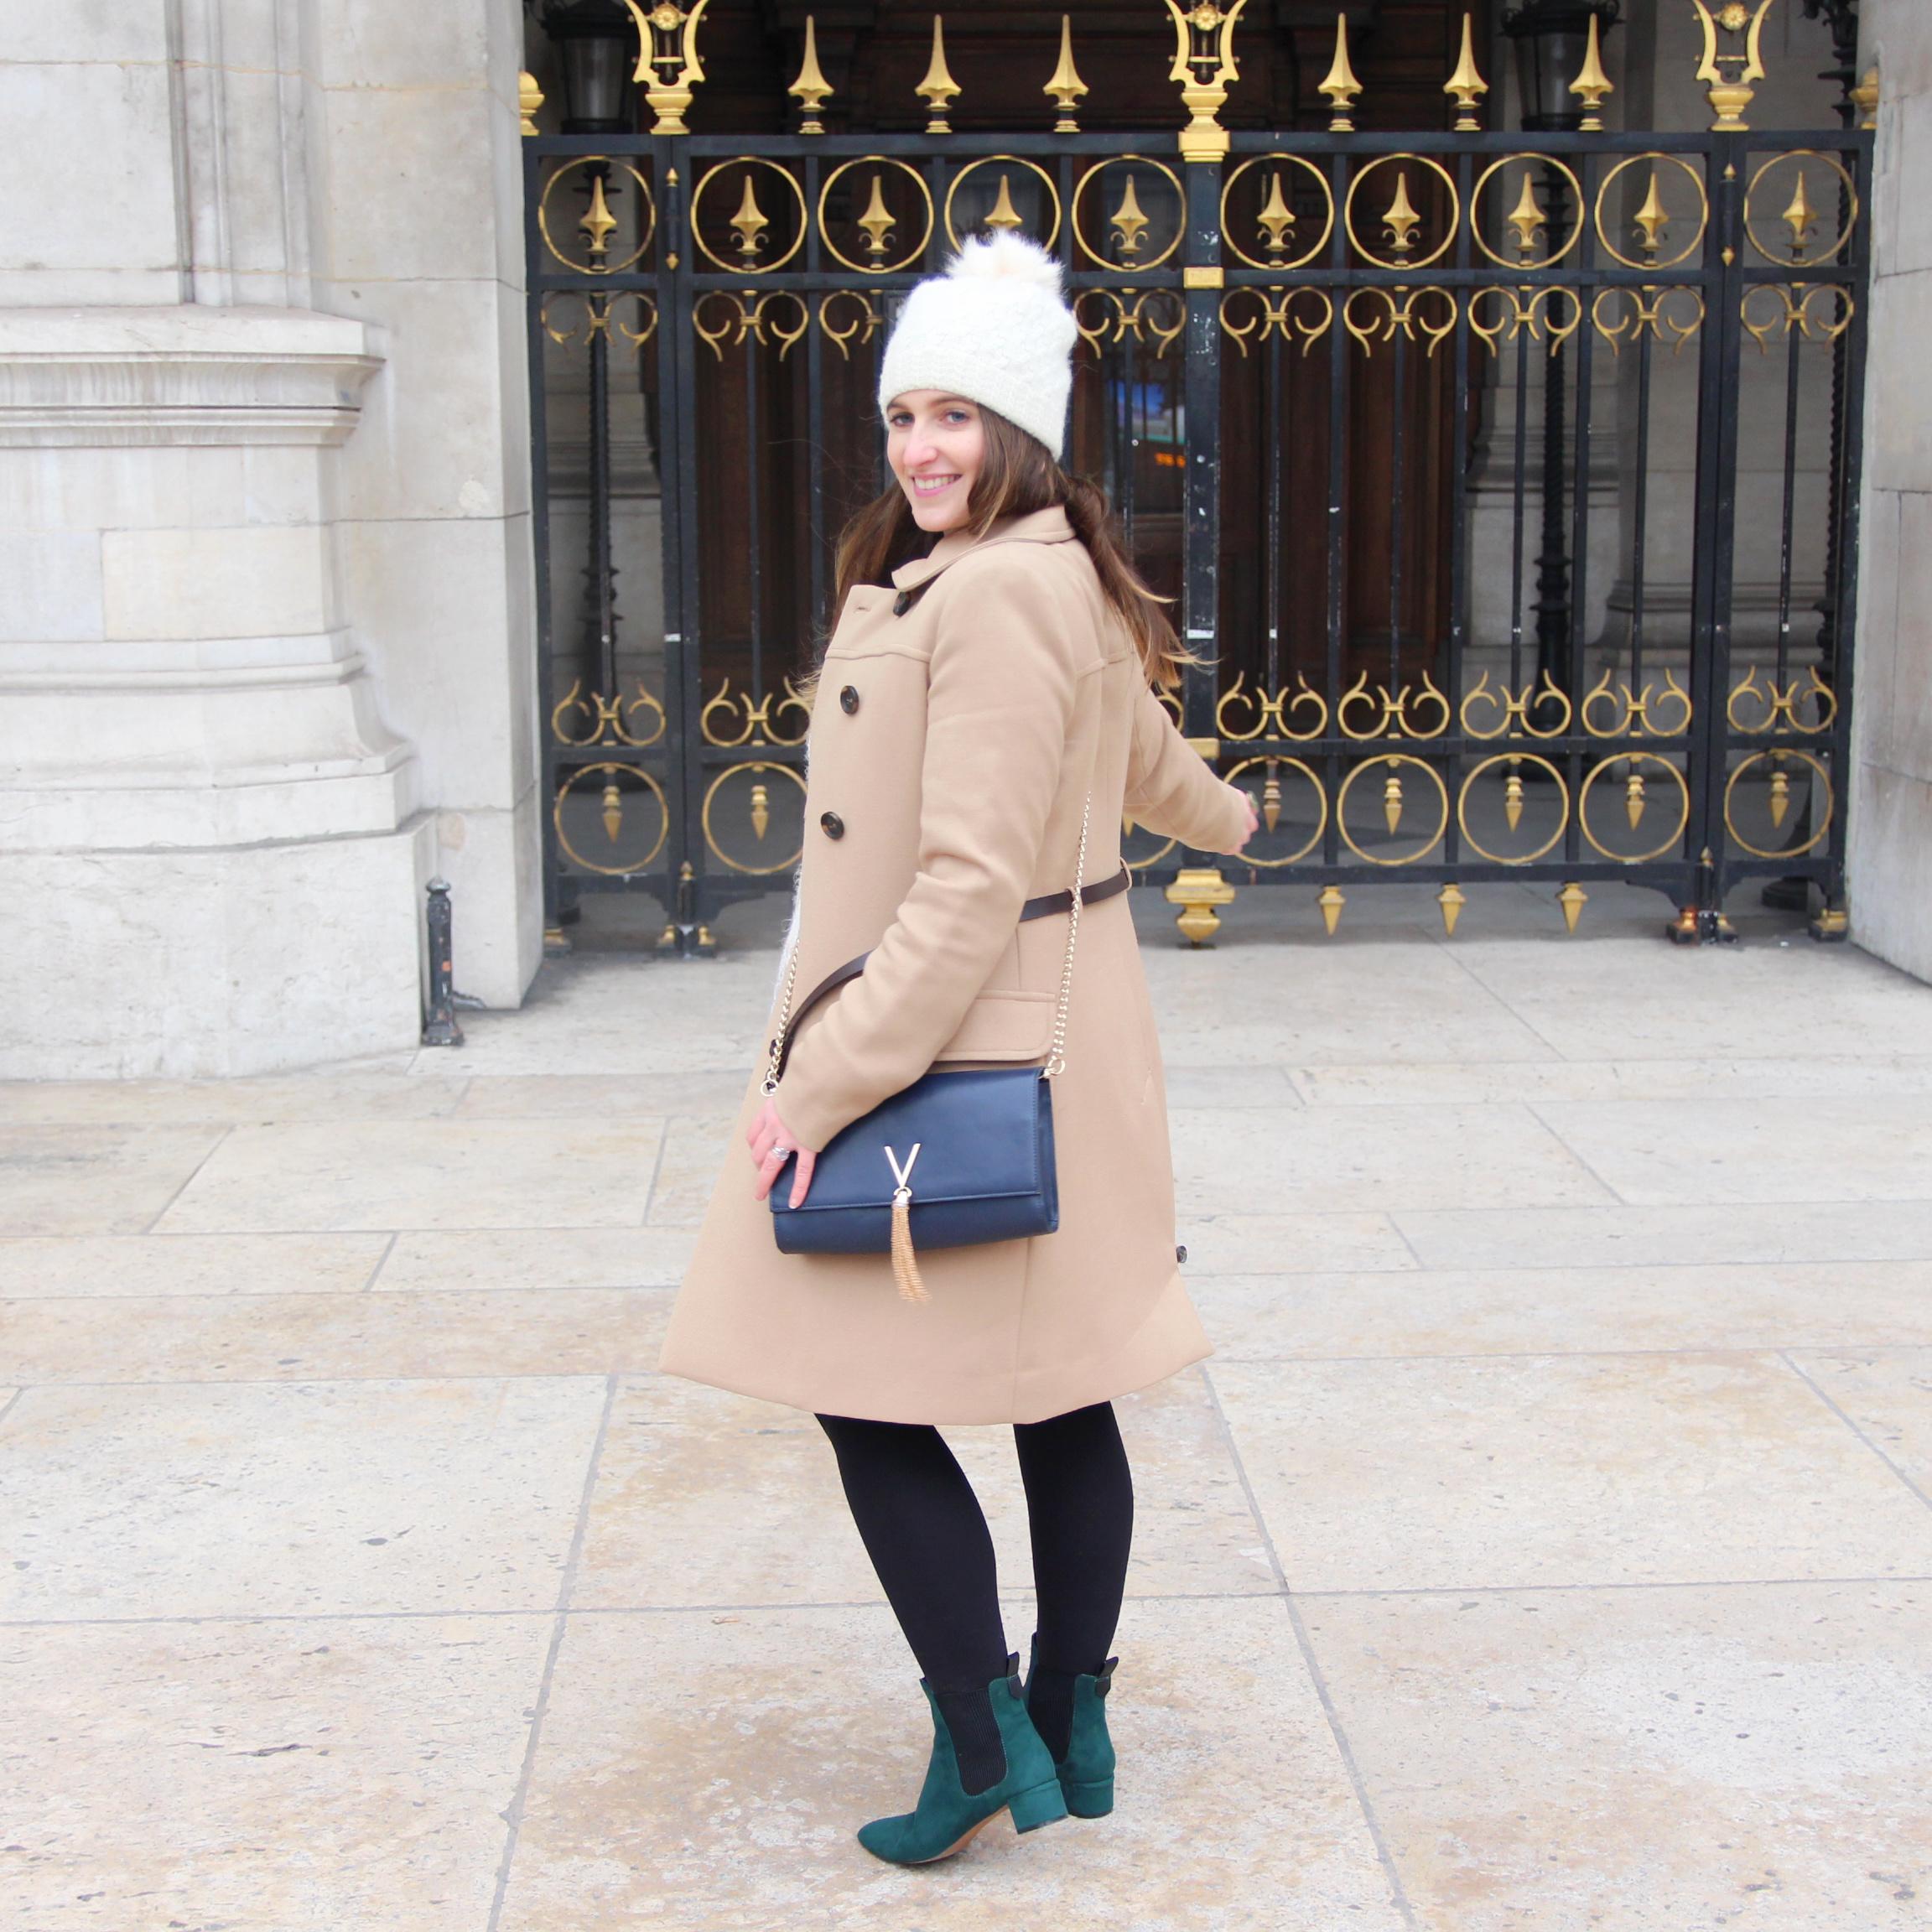 paris-opera-garnier-winter-day-influencer-style-personalstylist-imageconsultant-seralynepointcom-img_6697